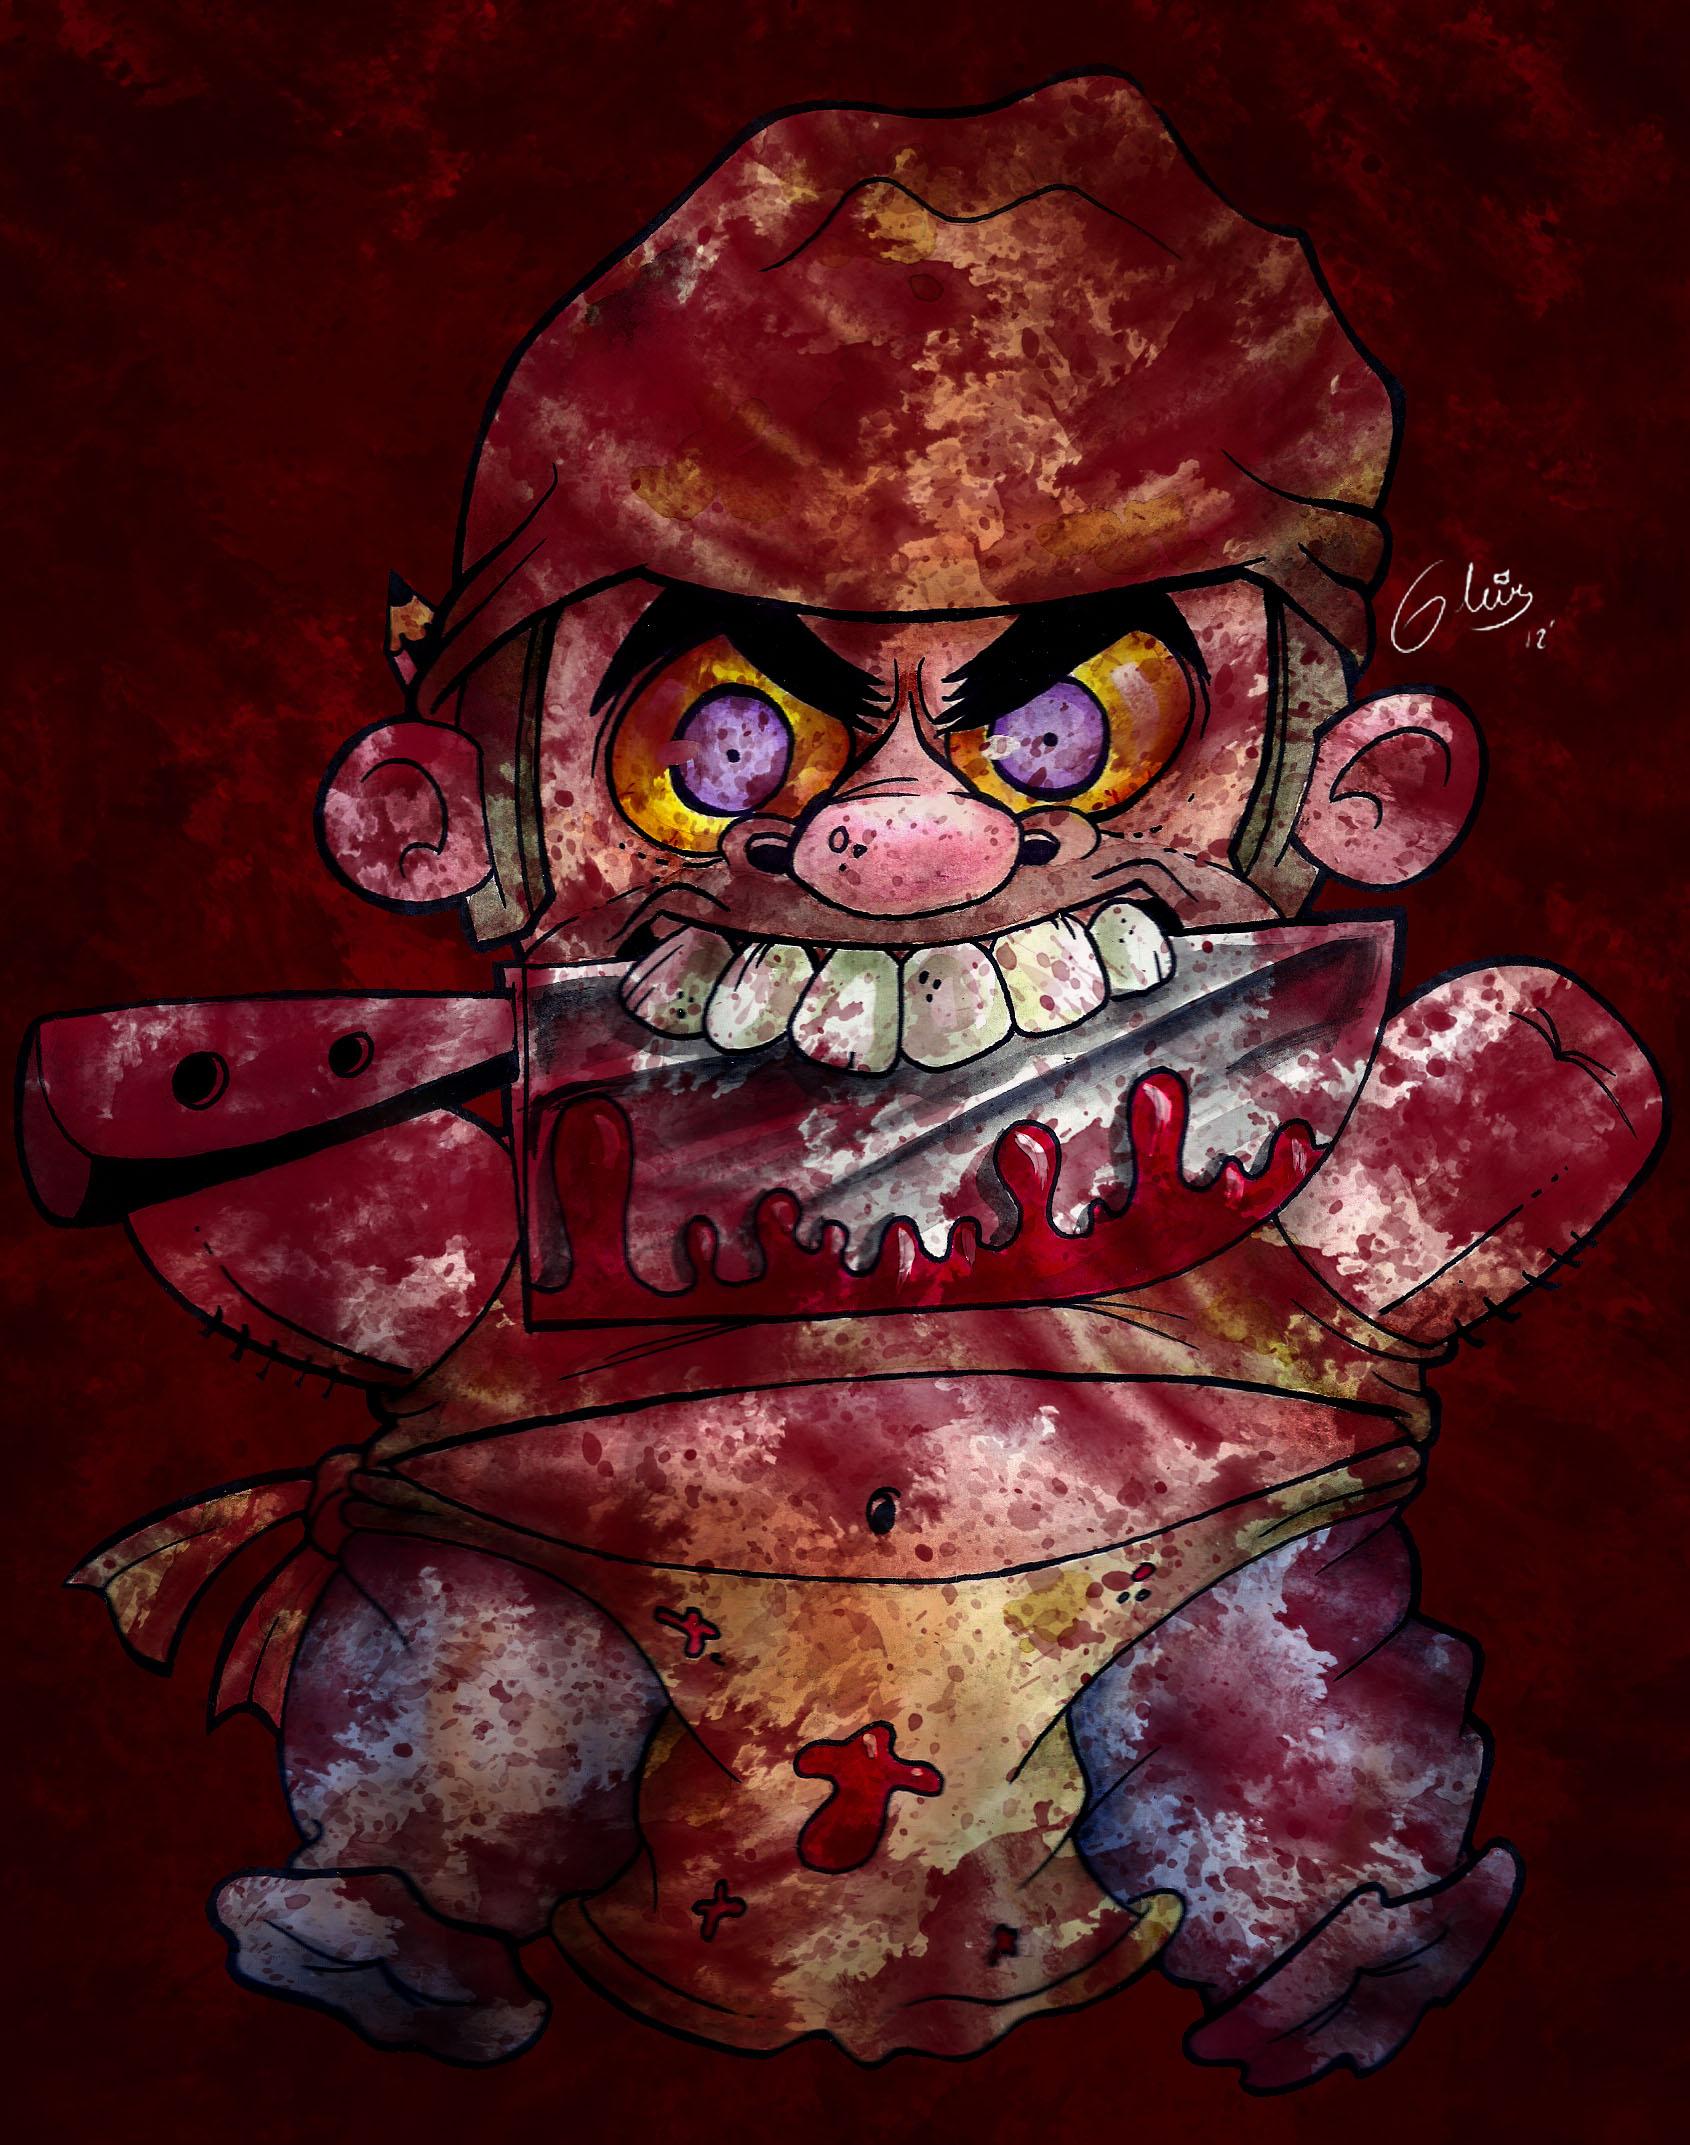 Carnicero Butcher